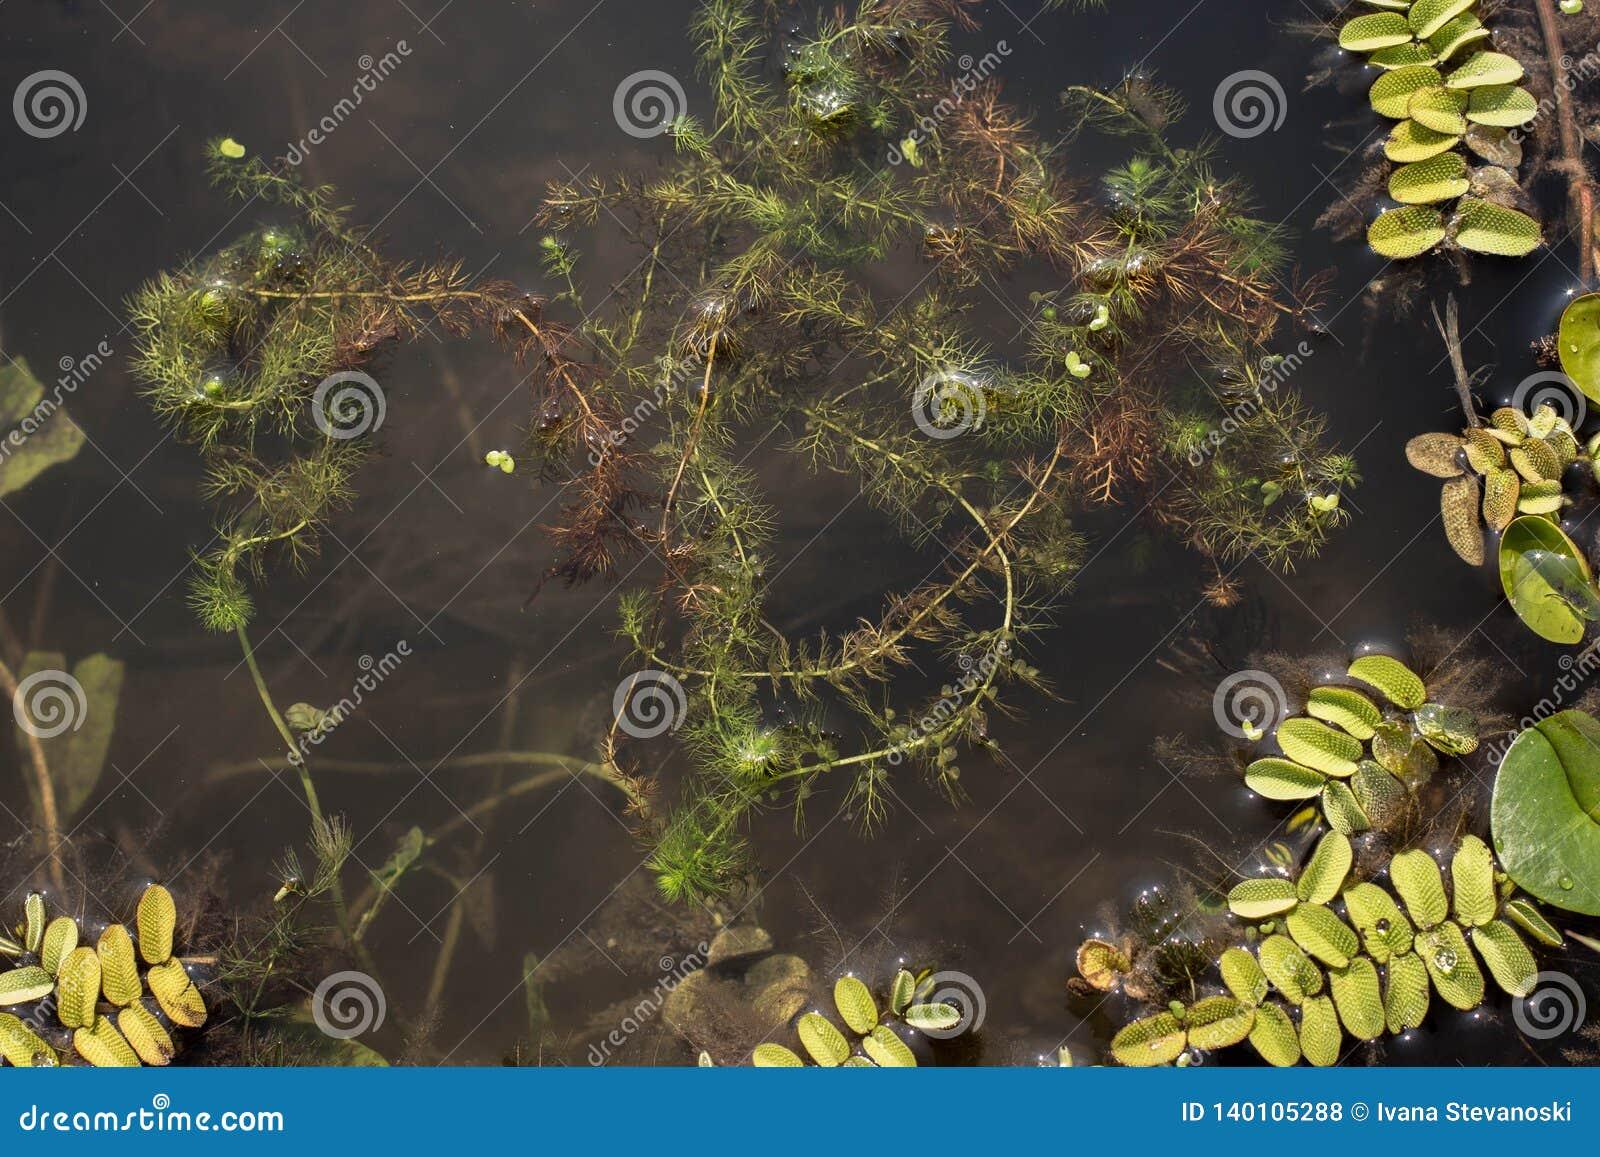 1 Carnivorous Bladderwort Plant Utricularia Vulgaris